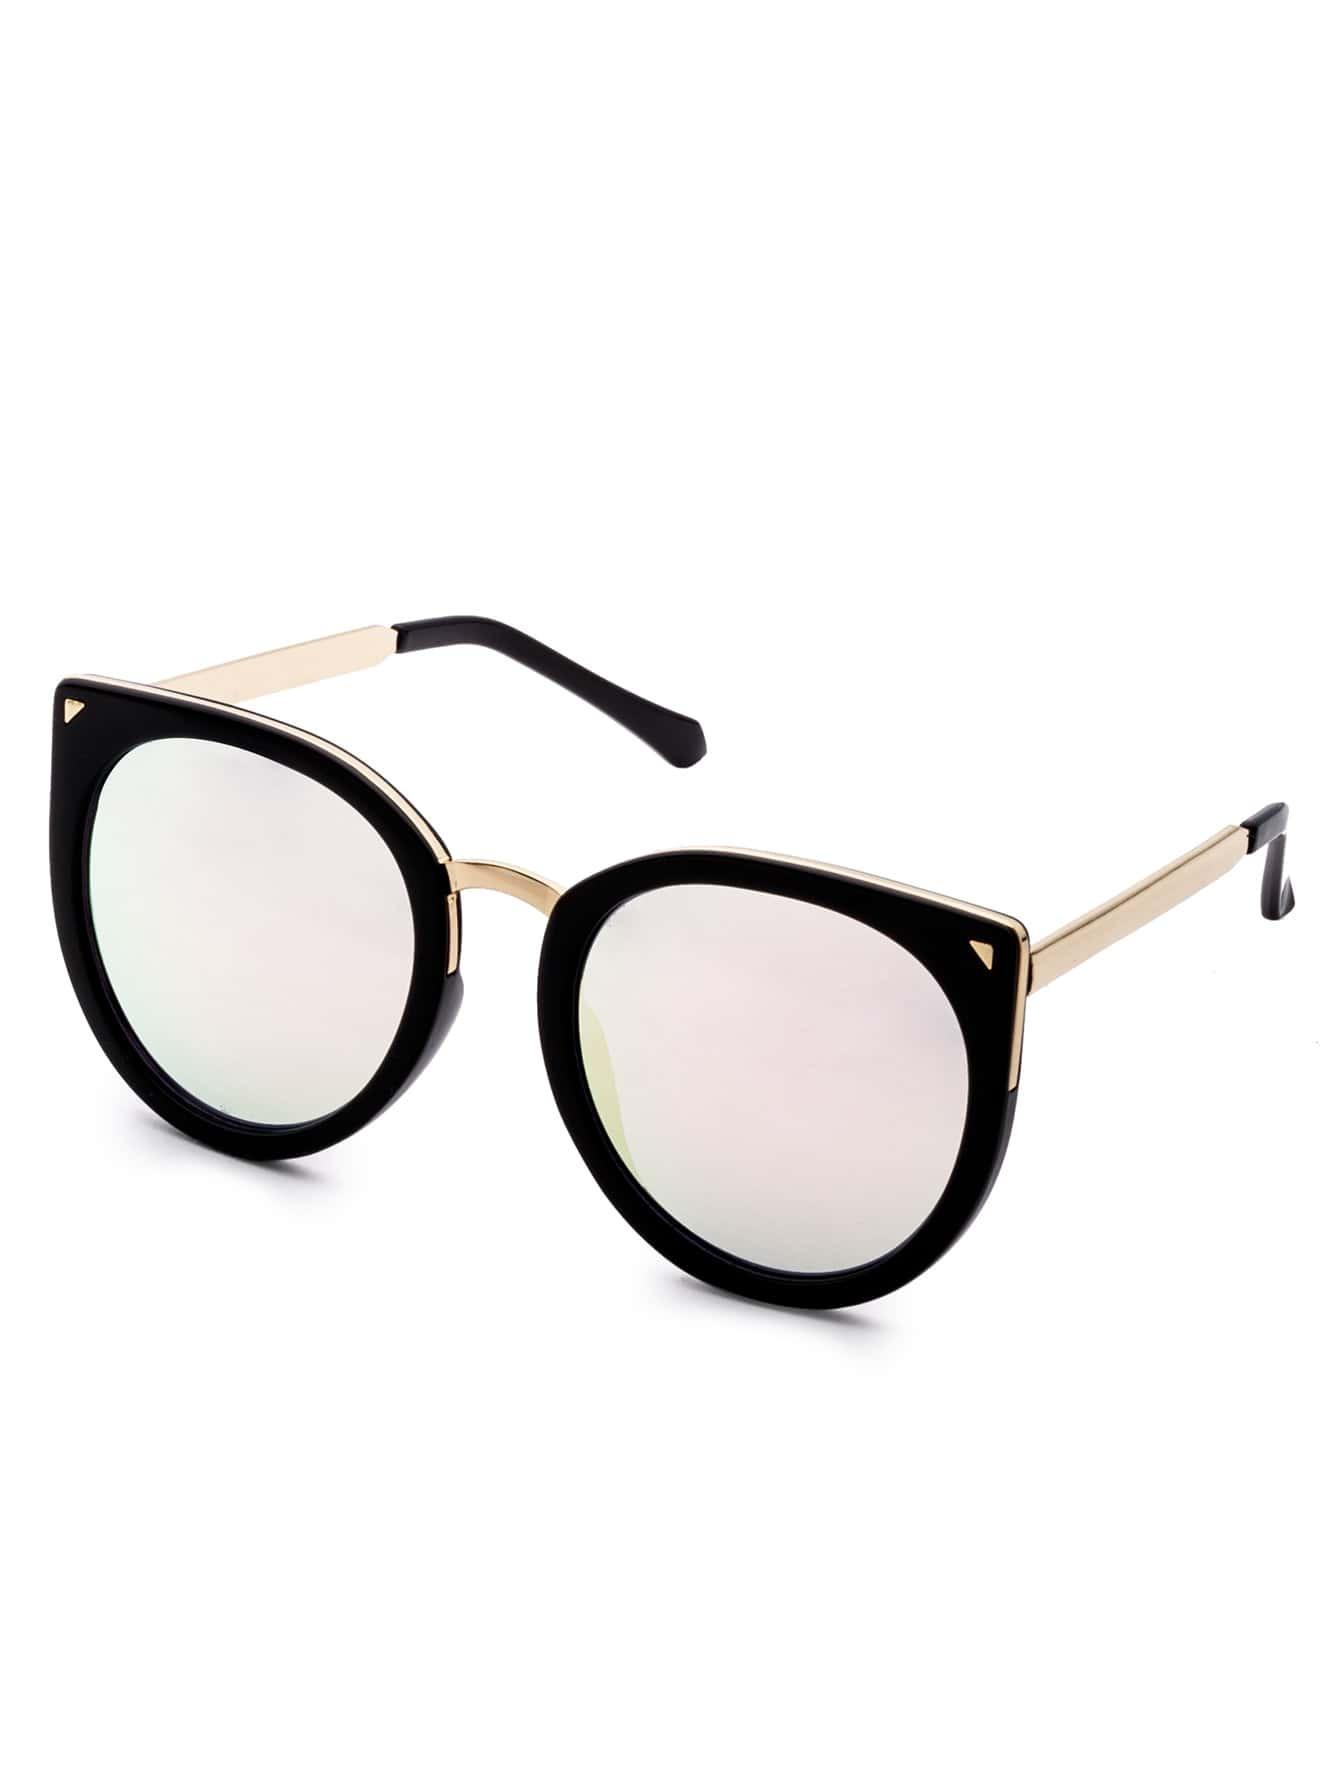 lunettes de soleil coup en m tal verre rose noir. Black Bedroom Furniture Sets. Home Design Ideas